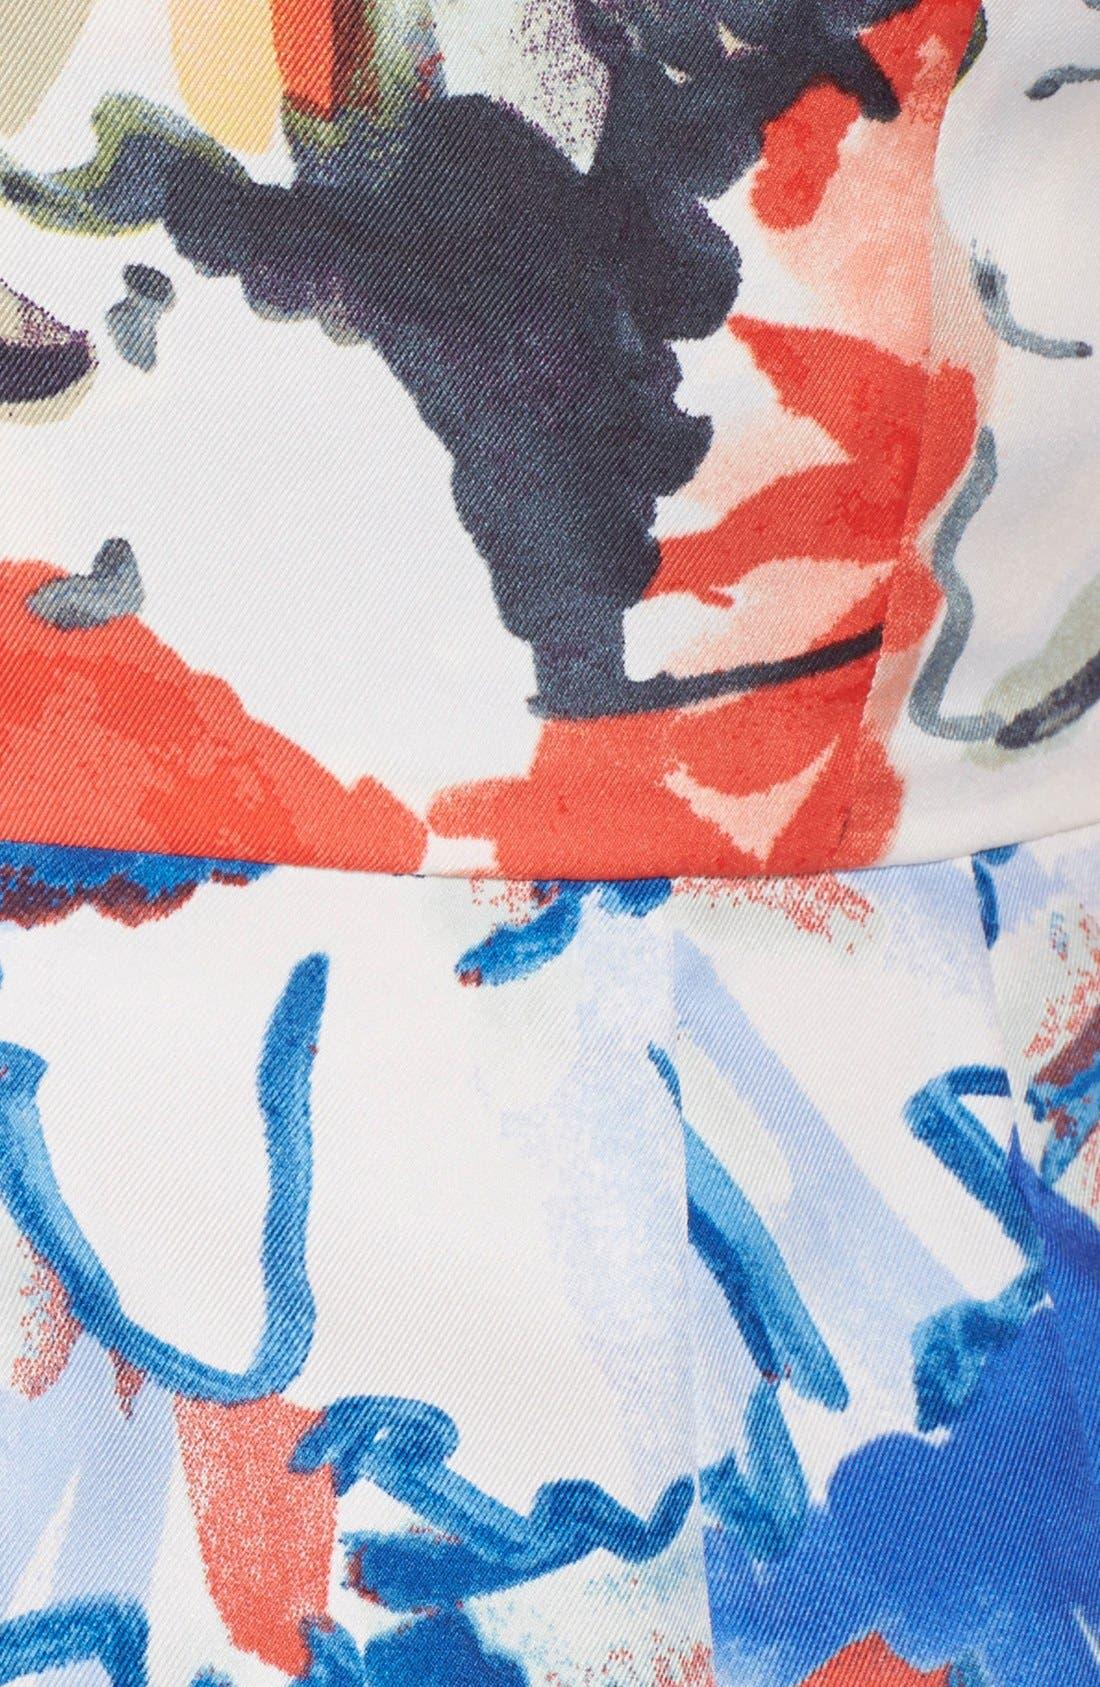 Floral Print Fit & Flare Dress,                             Alternate thumbnail 4, color,                             405